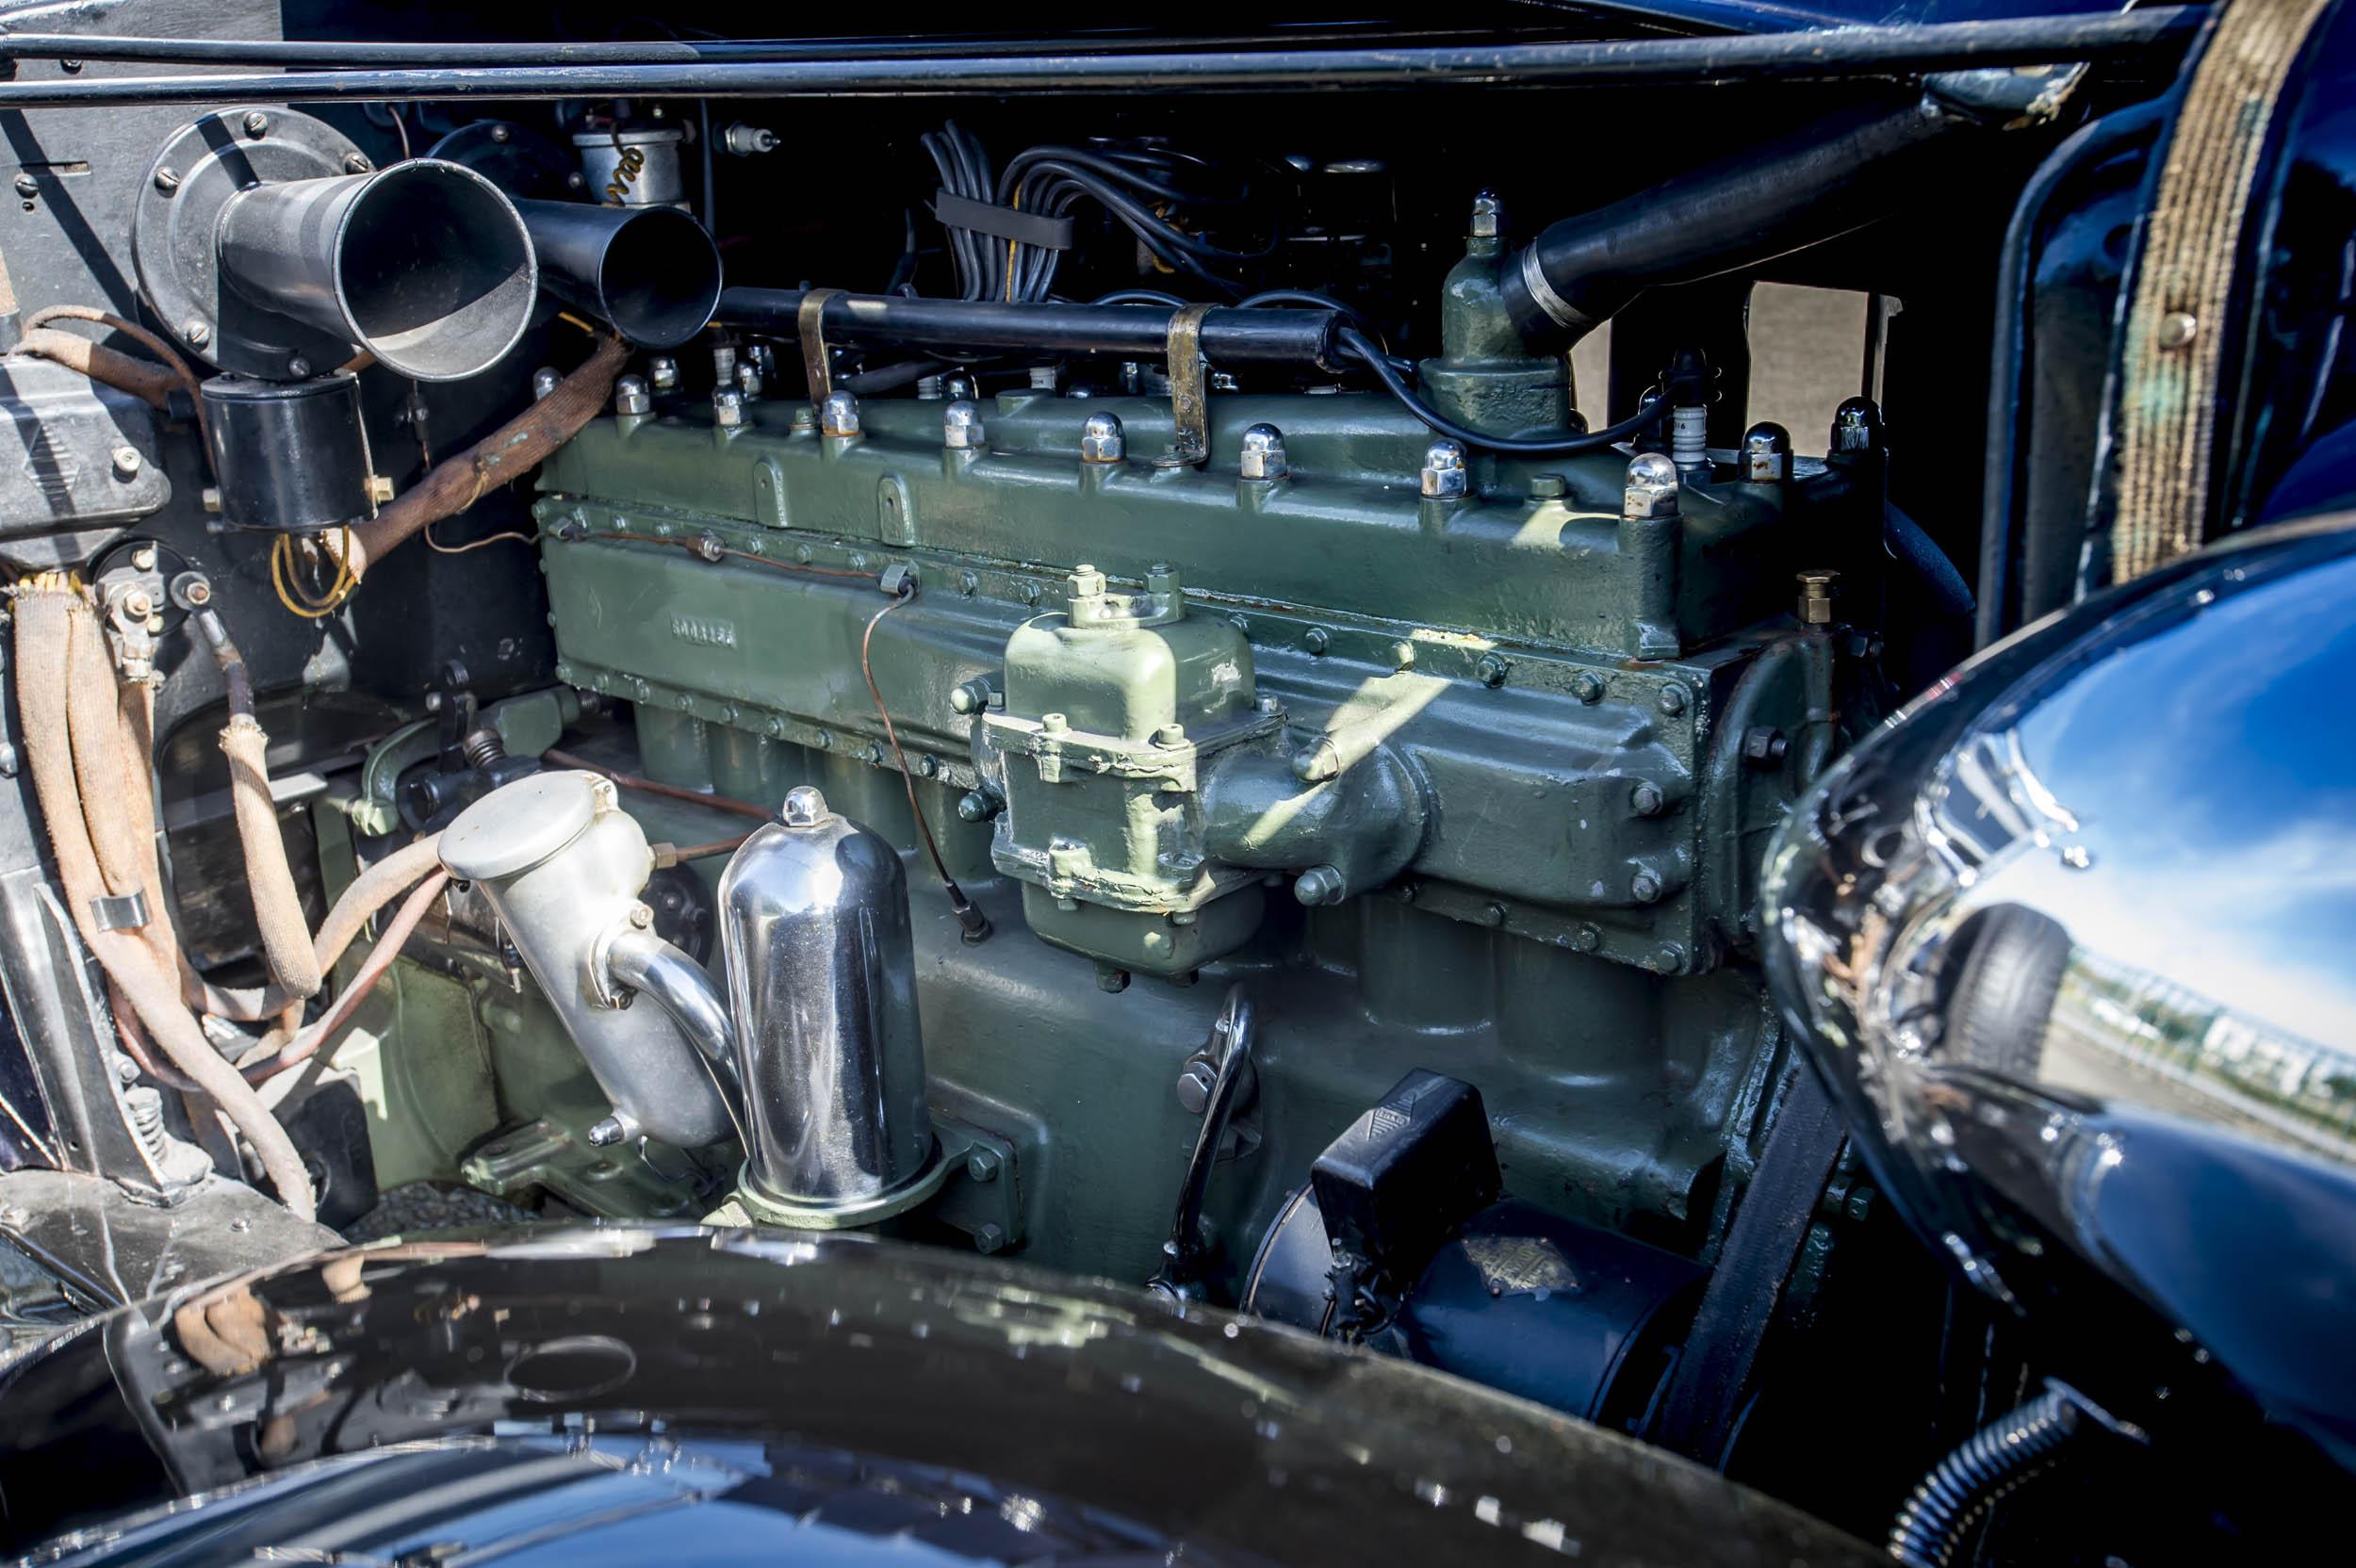 1929 renault nervastella coupe de ville engine close-up